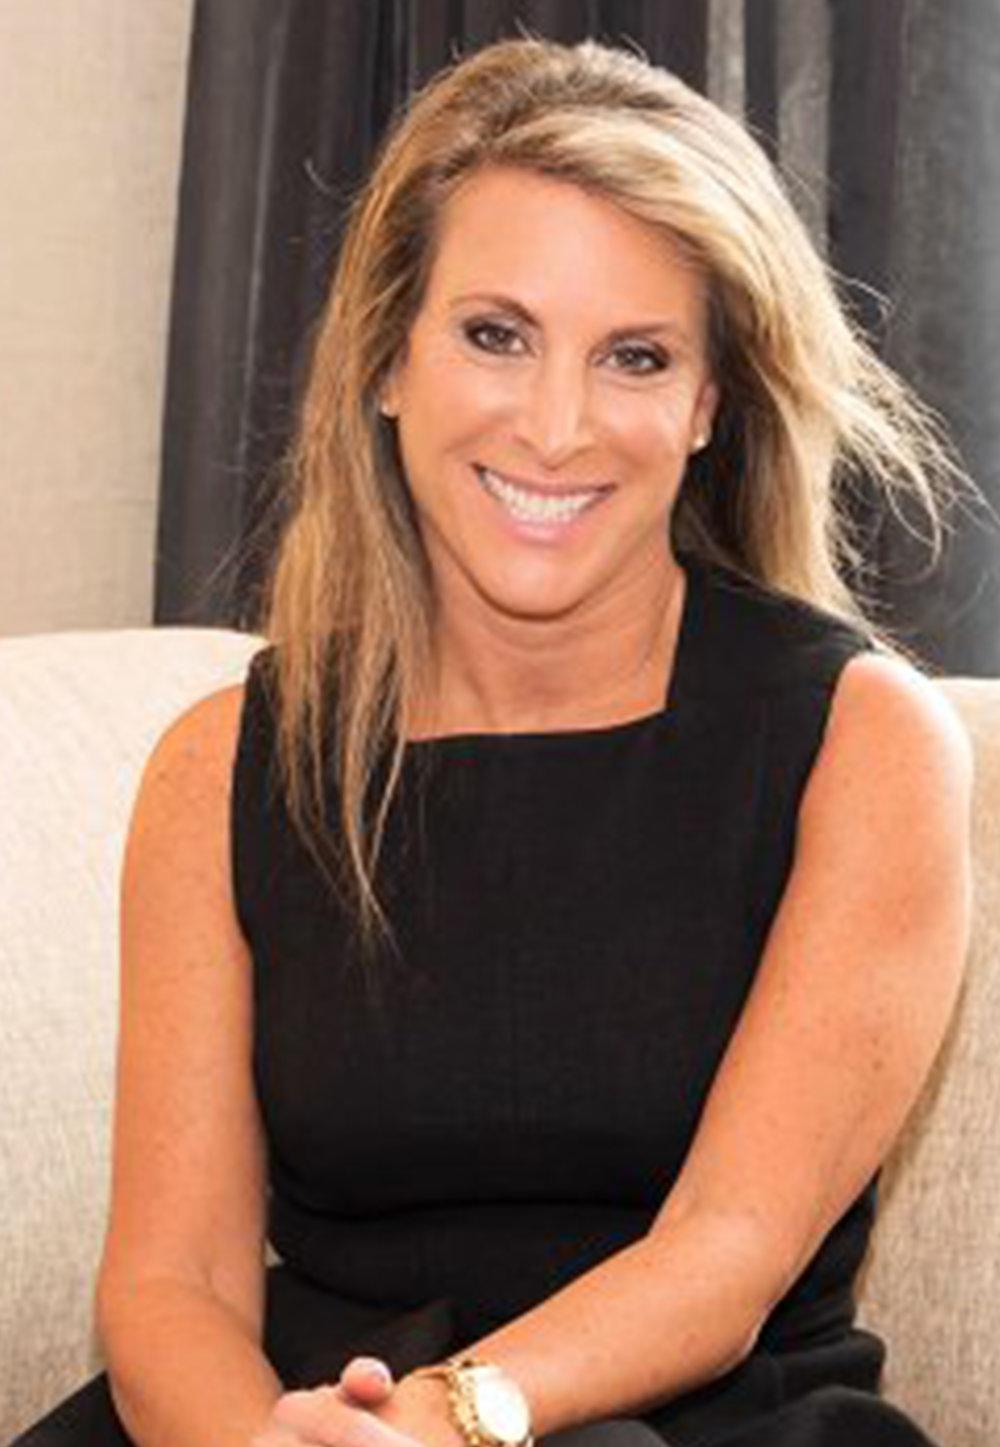 Shelley Zalis